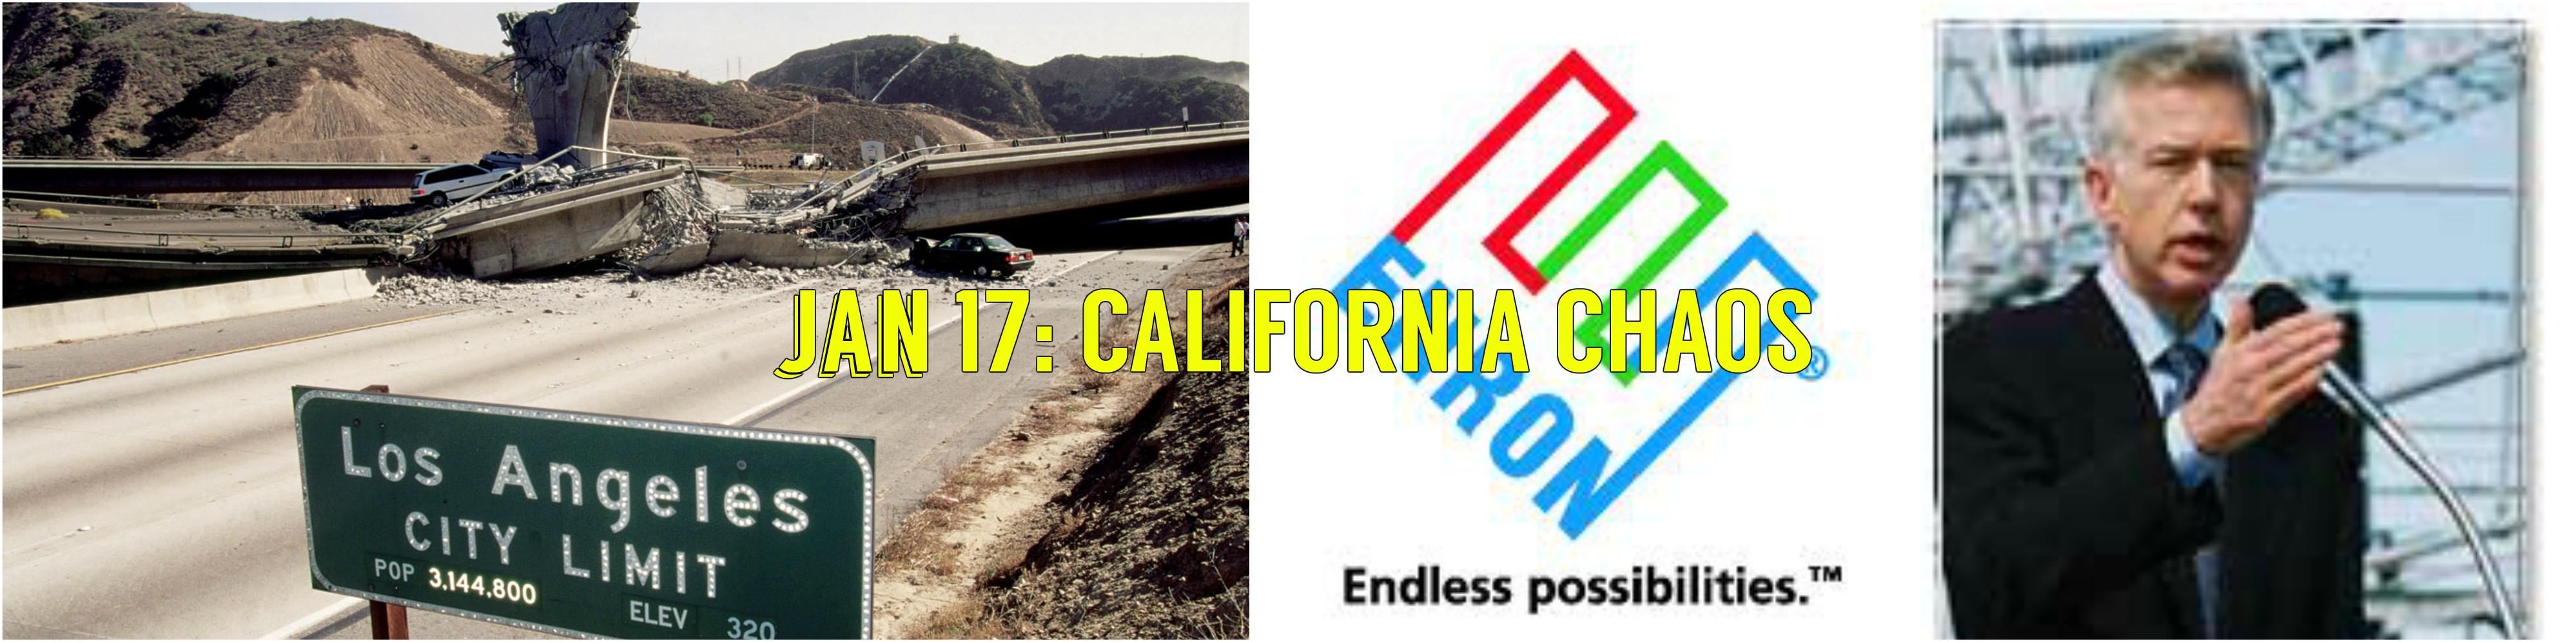 Jan-17 (Pt 2): California Chaos